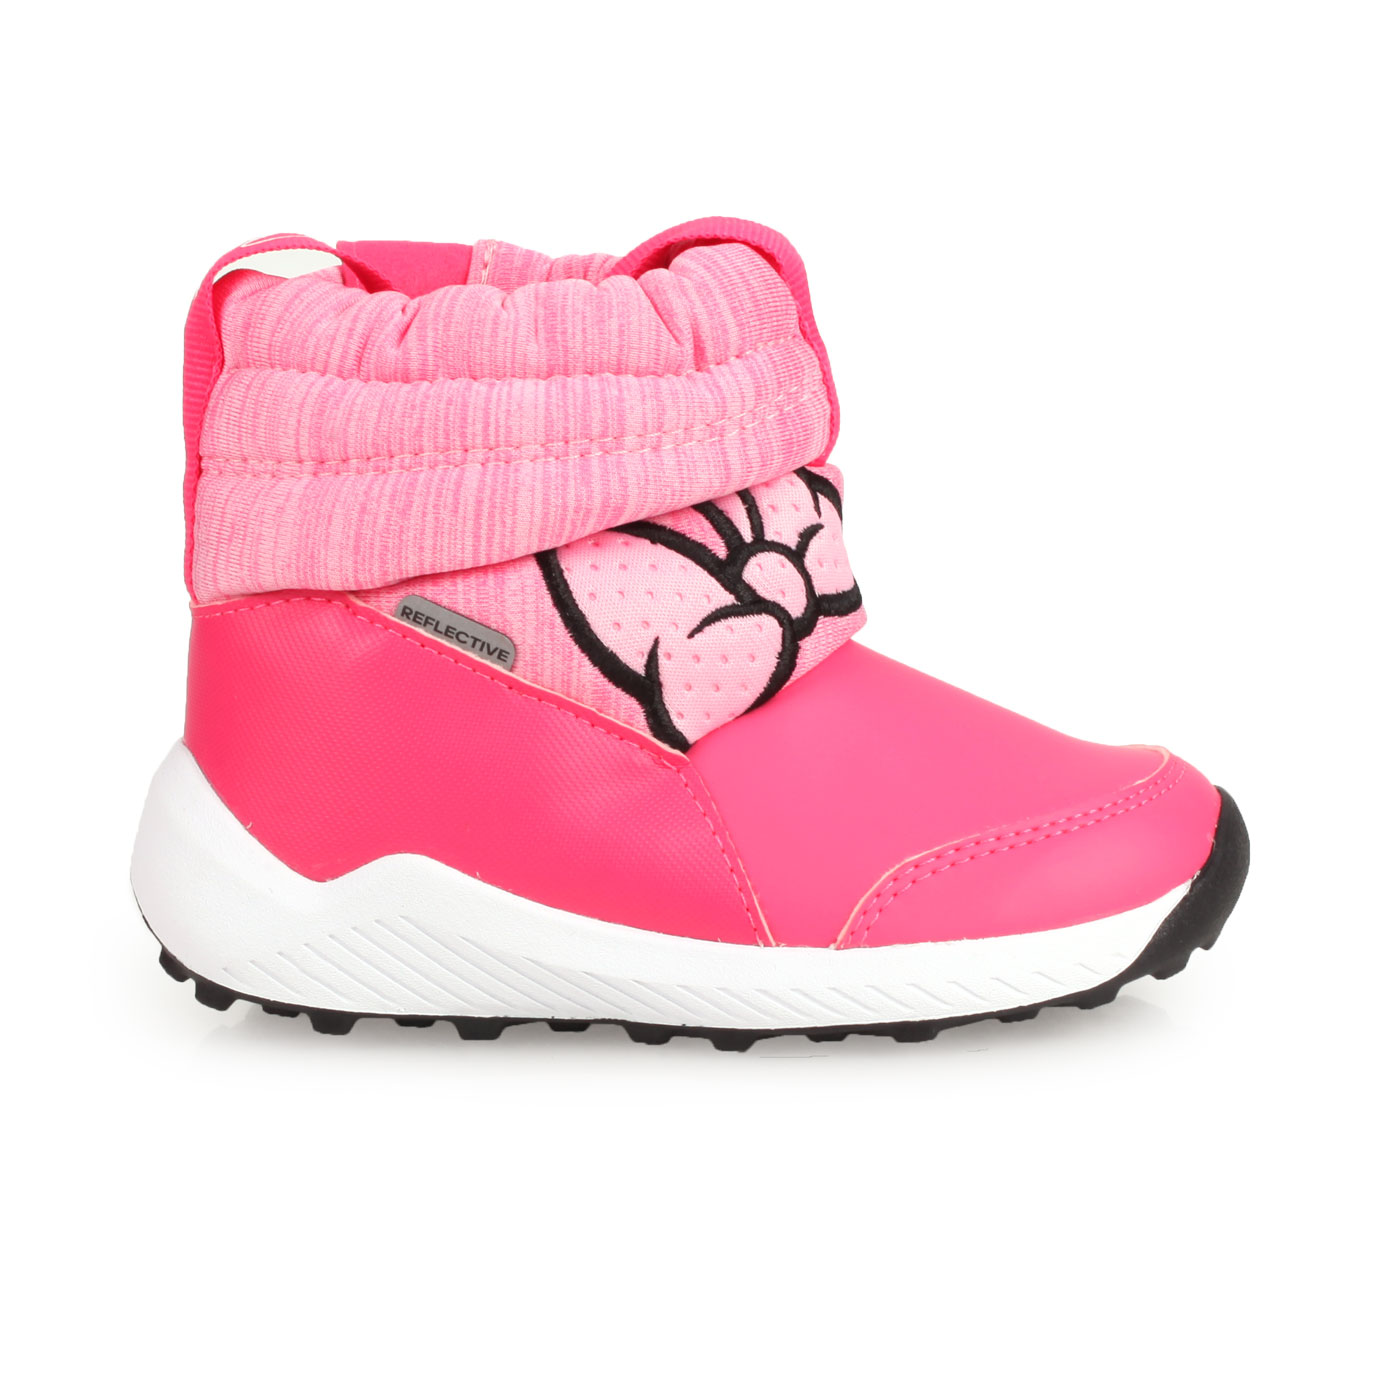 ADIDAS 小童保暖短筒靴  @RapidaSnow Minnie I@G27543